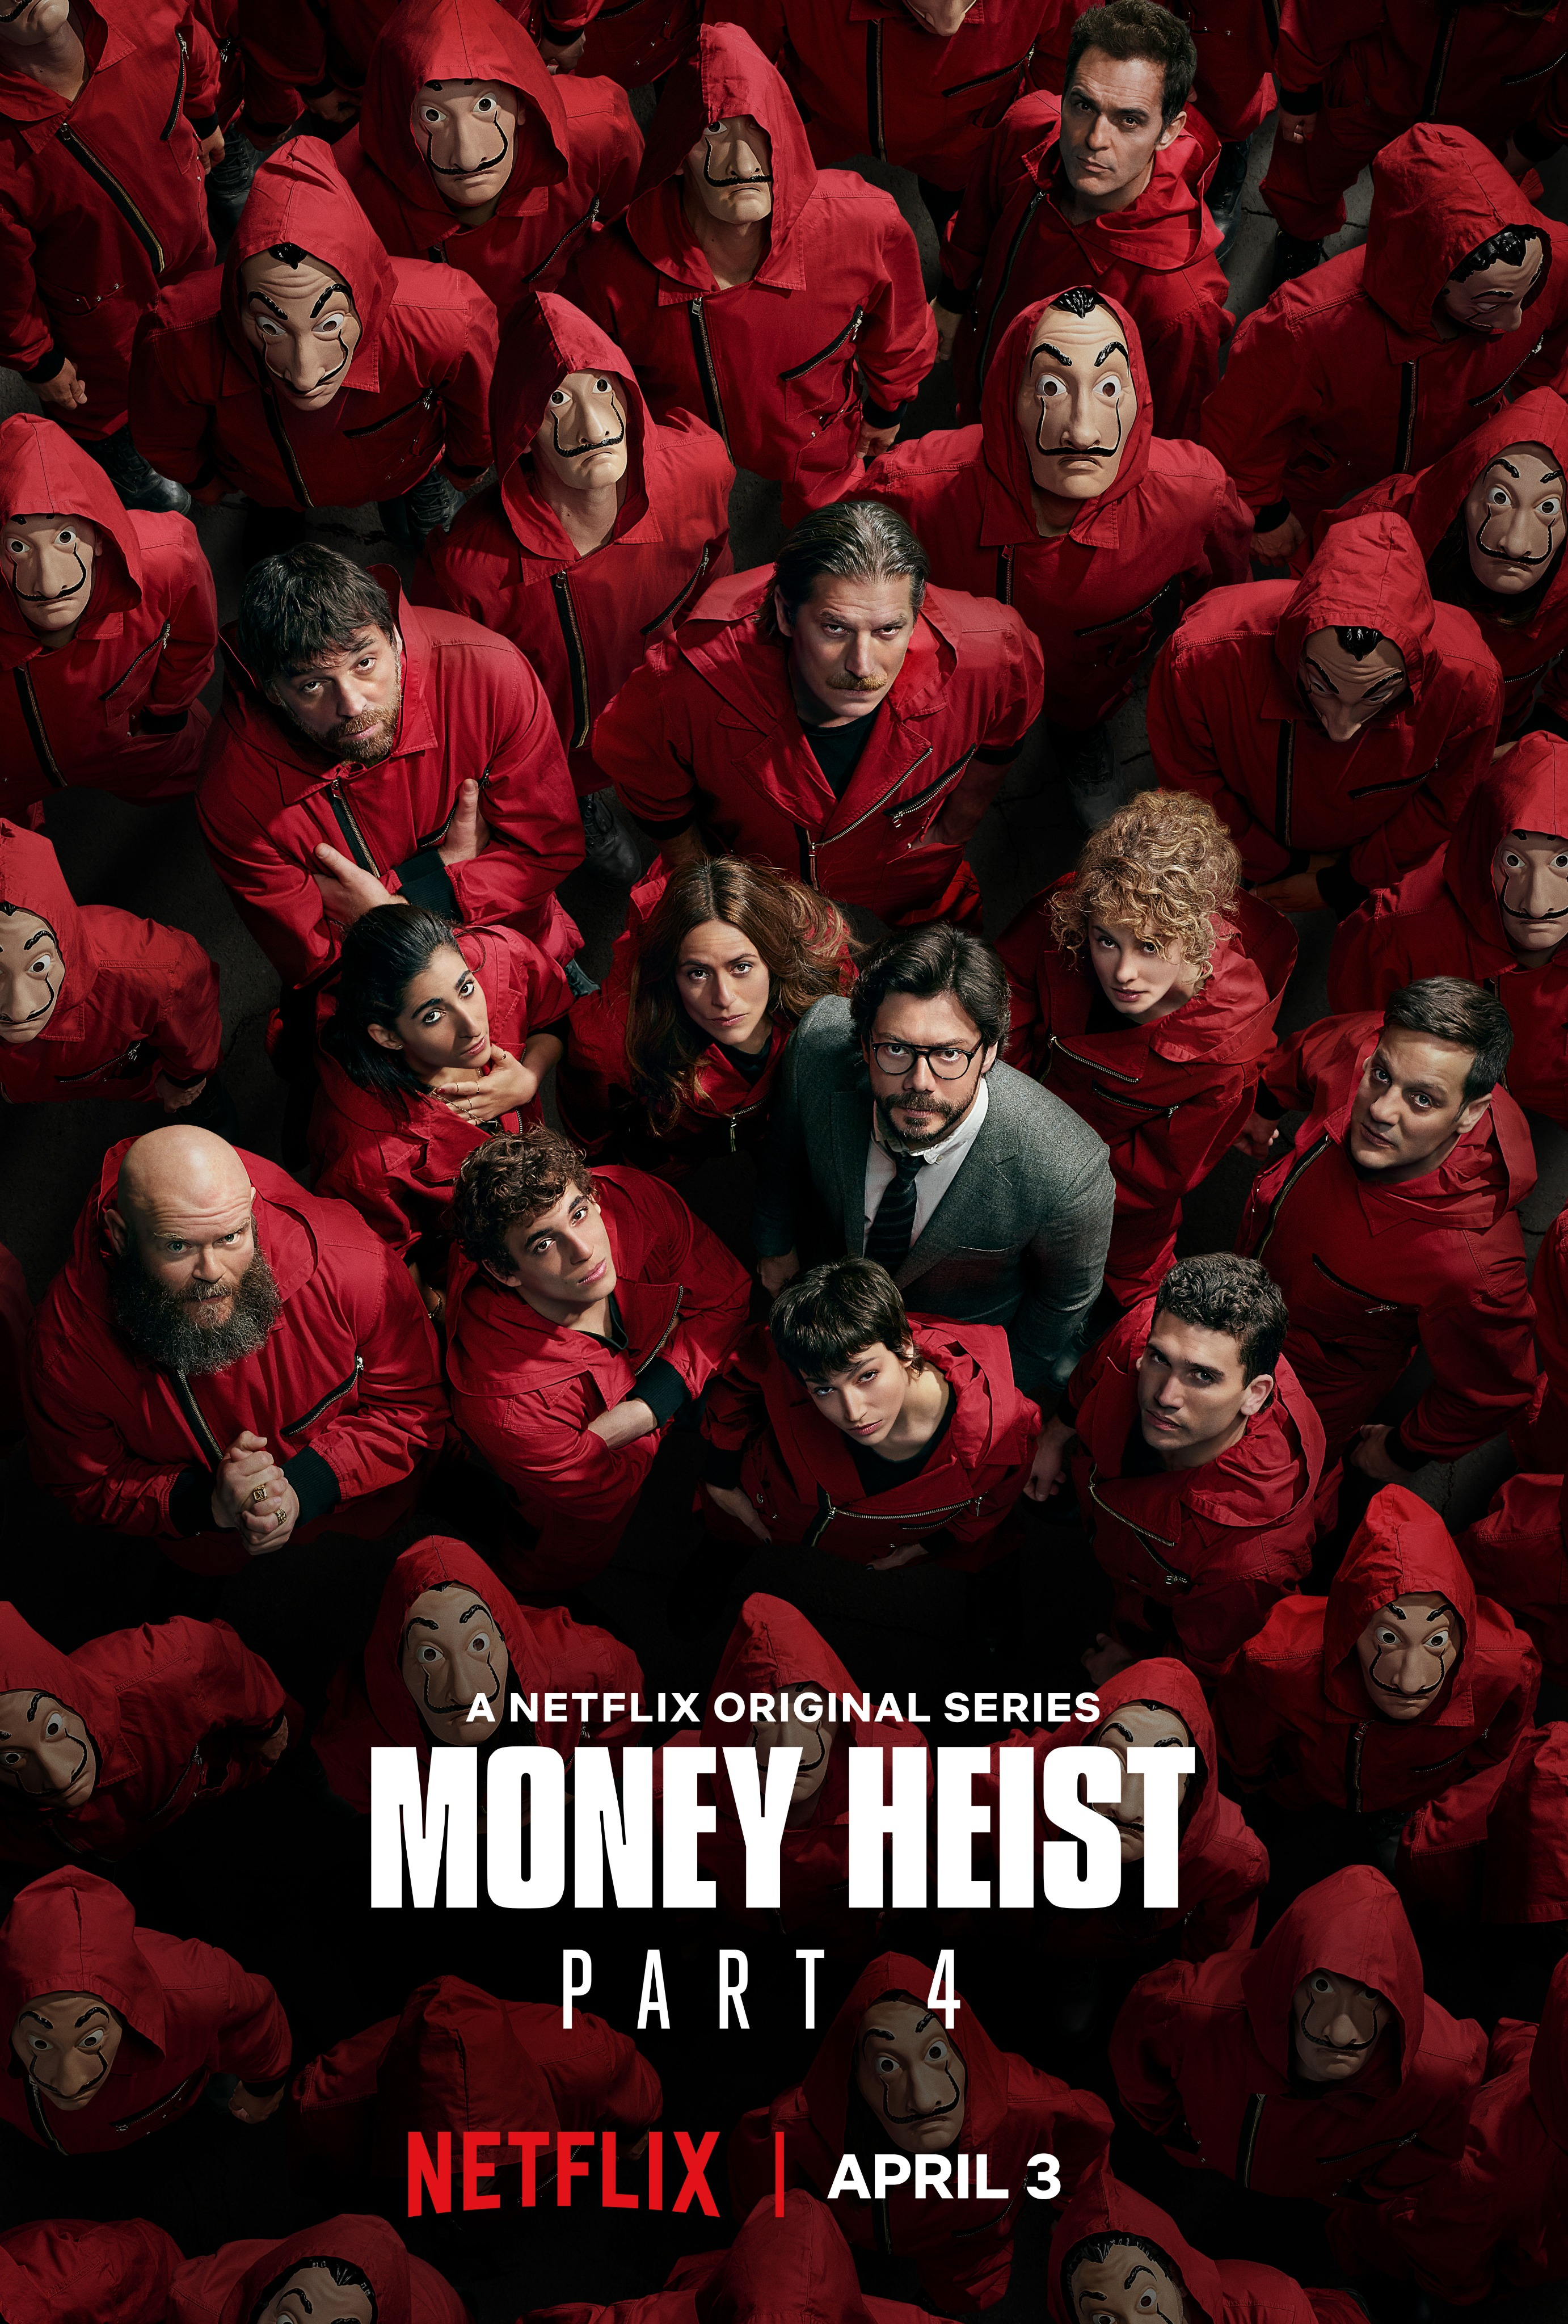 Money Heist 2020 S04 Complete Hindi NF Series 1.2GB HDRip Download